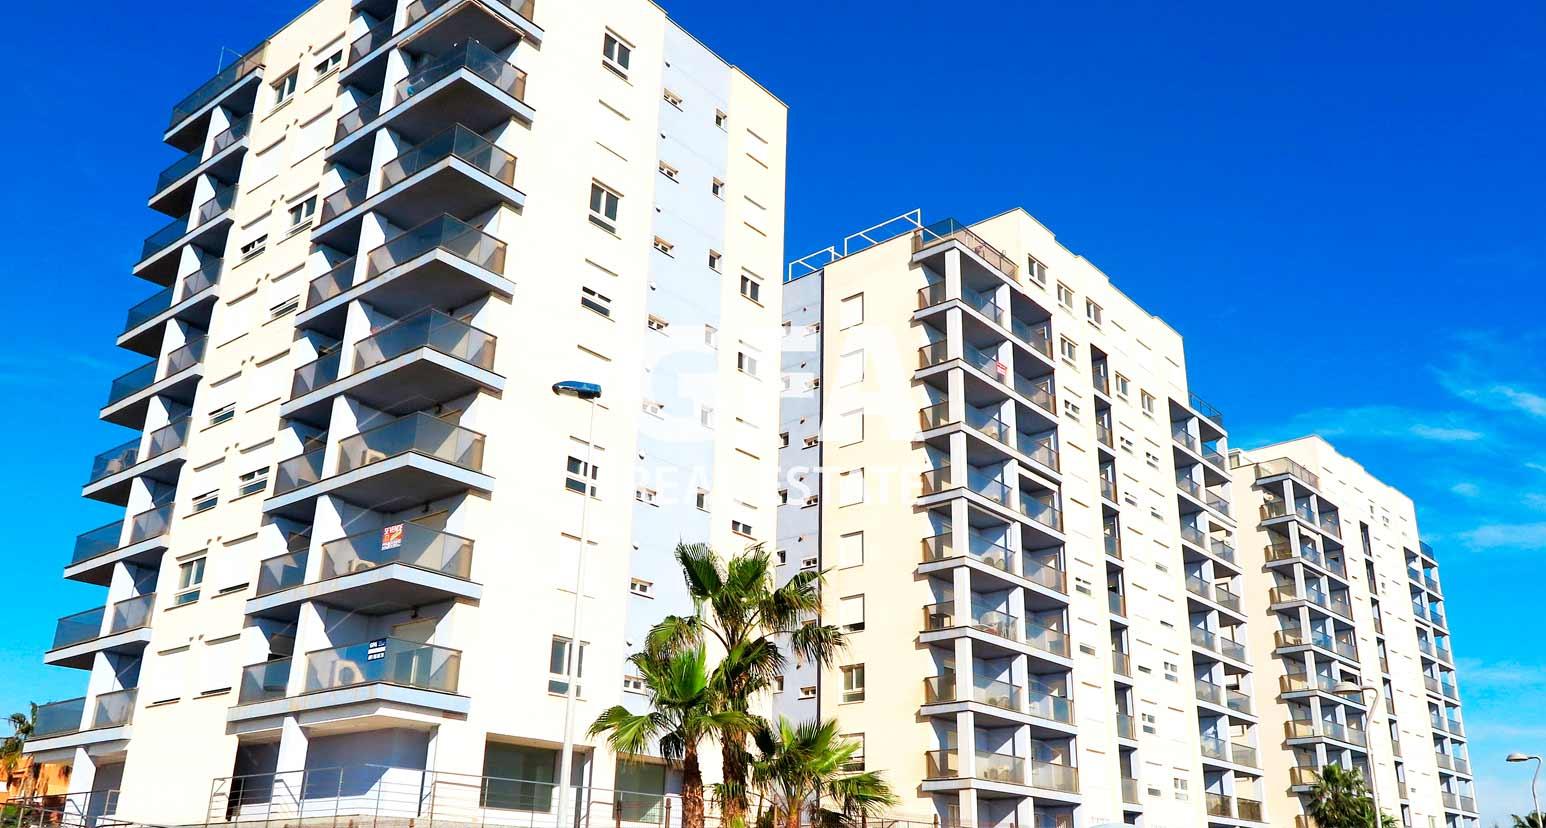 pisos-venta-la-manga-veneziola-2